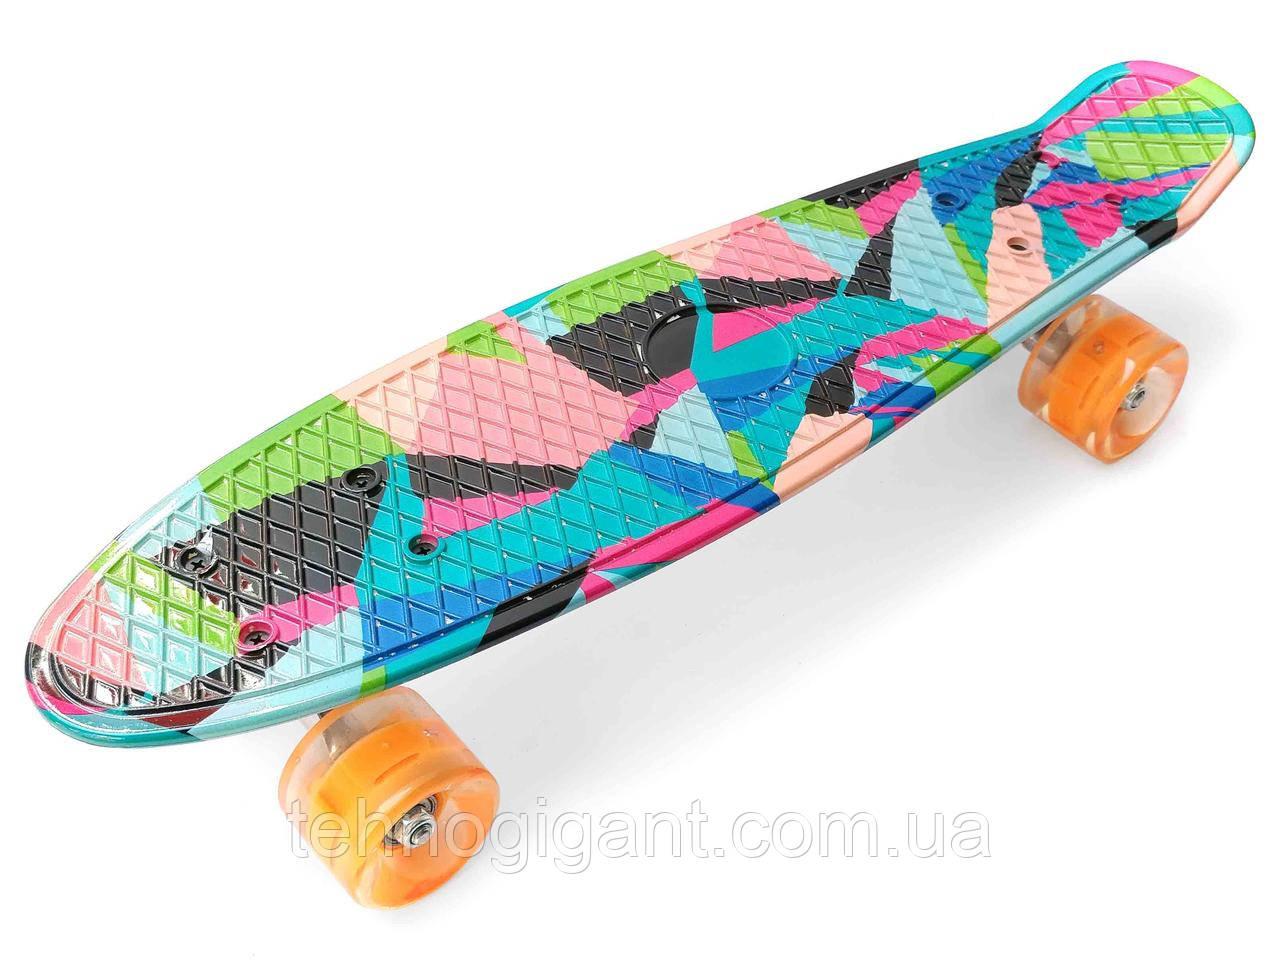 Скейт Penny Board, с широкими светящимися колесами Пенни борд, детский , от 4 лет, расцветка Ромбы